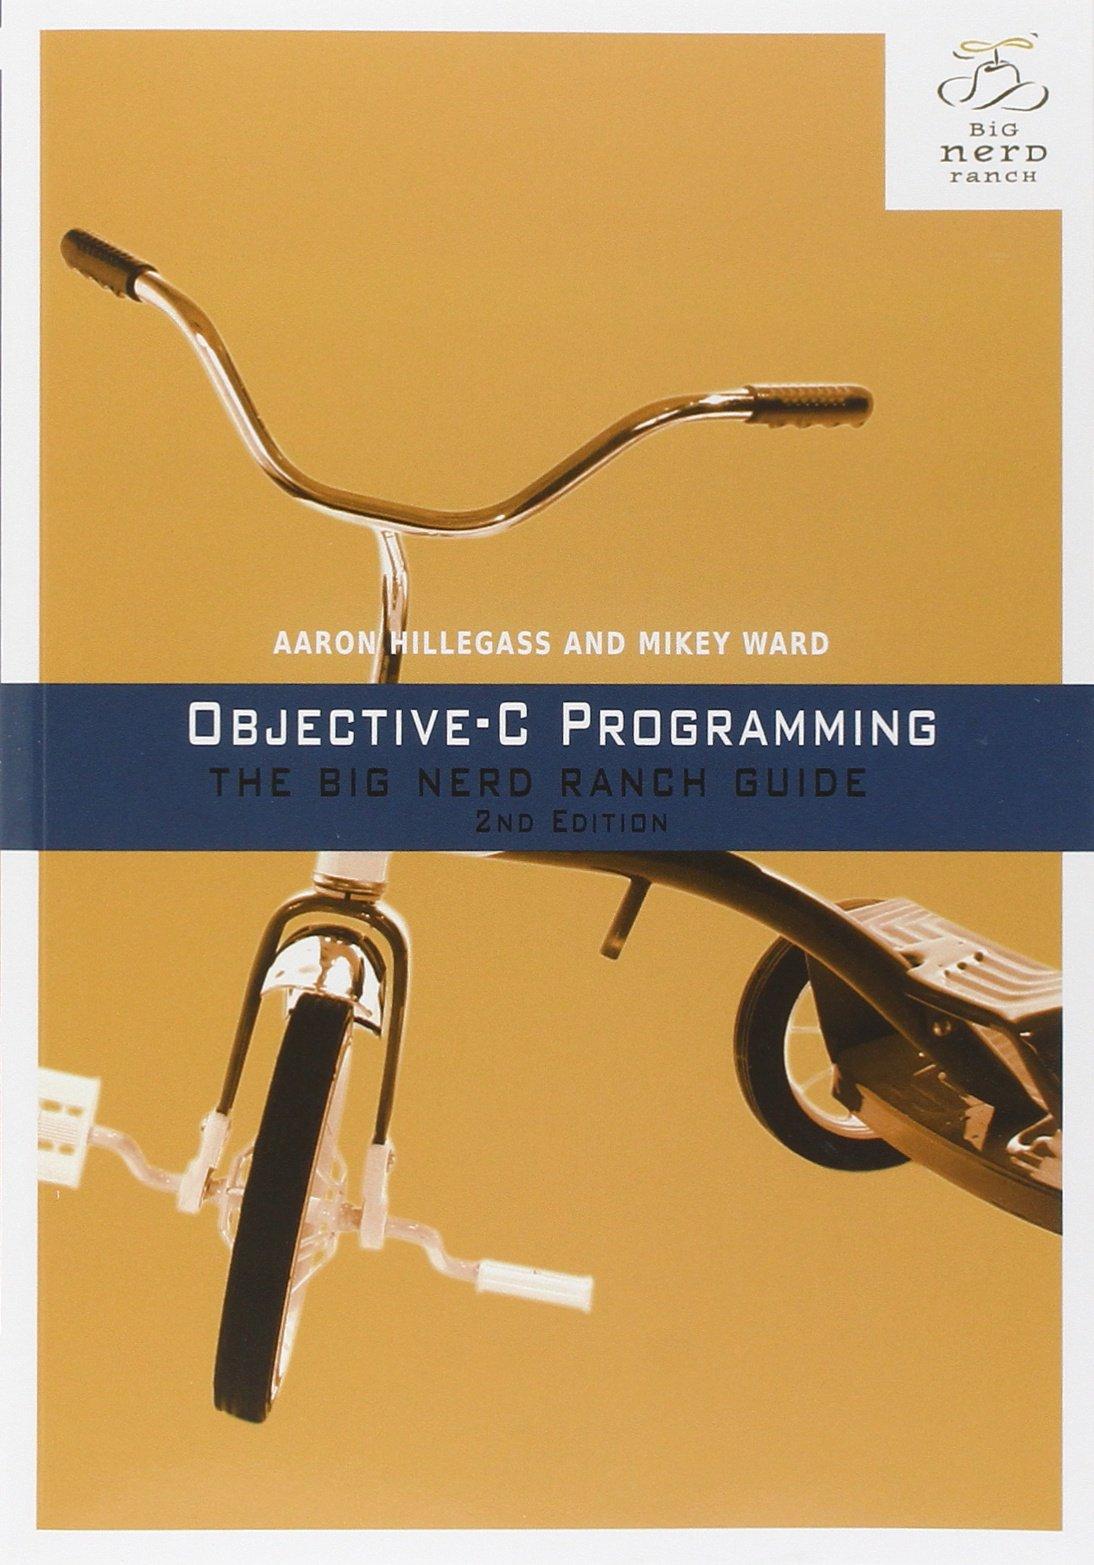 Objective-C Programming ISBN-13 9780321942067